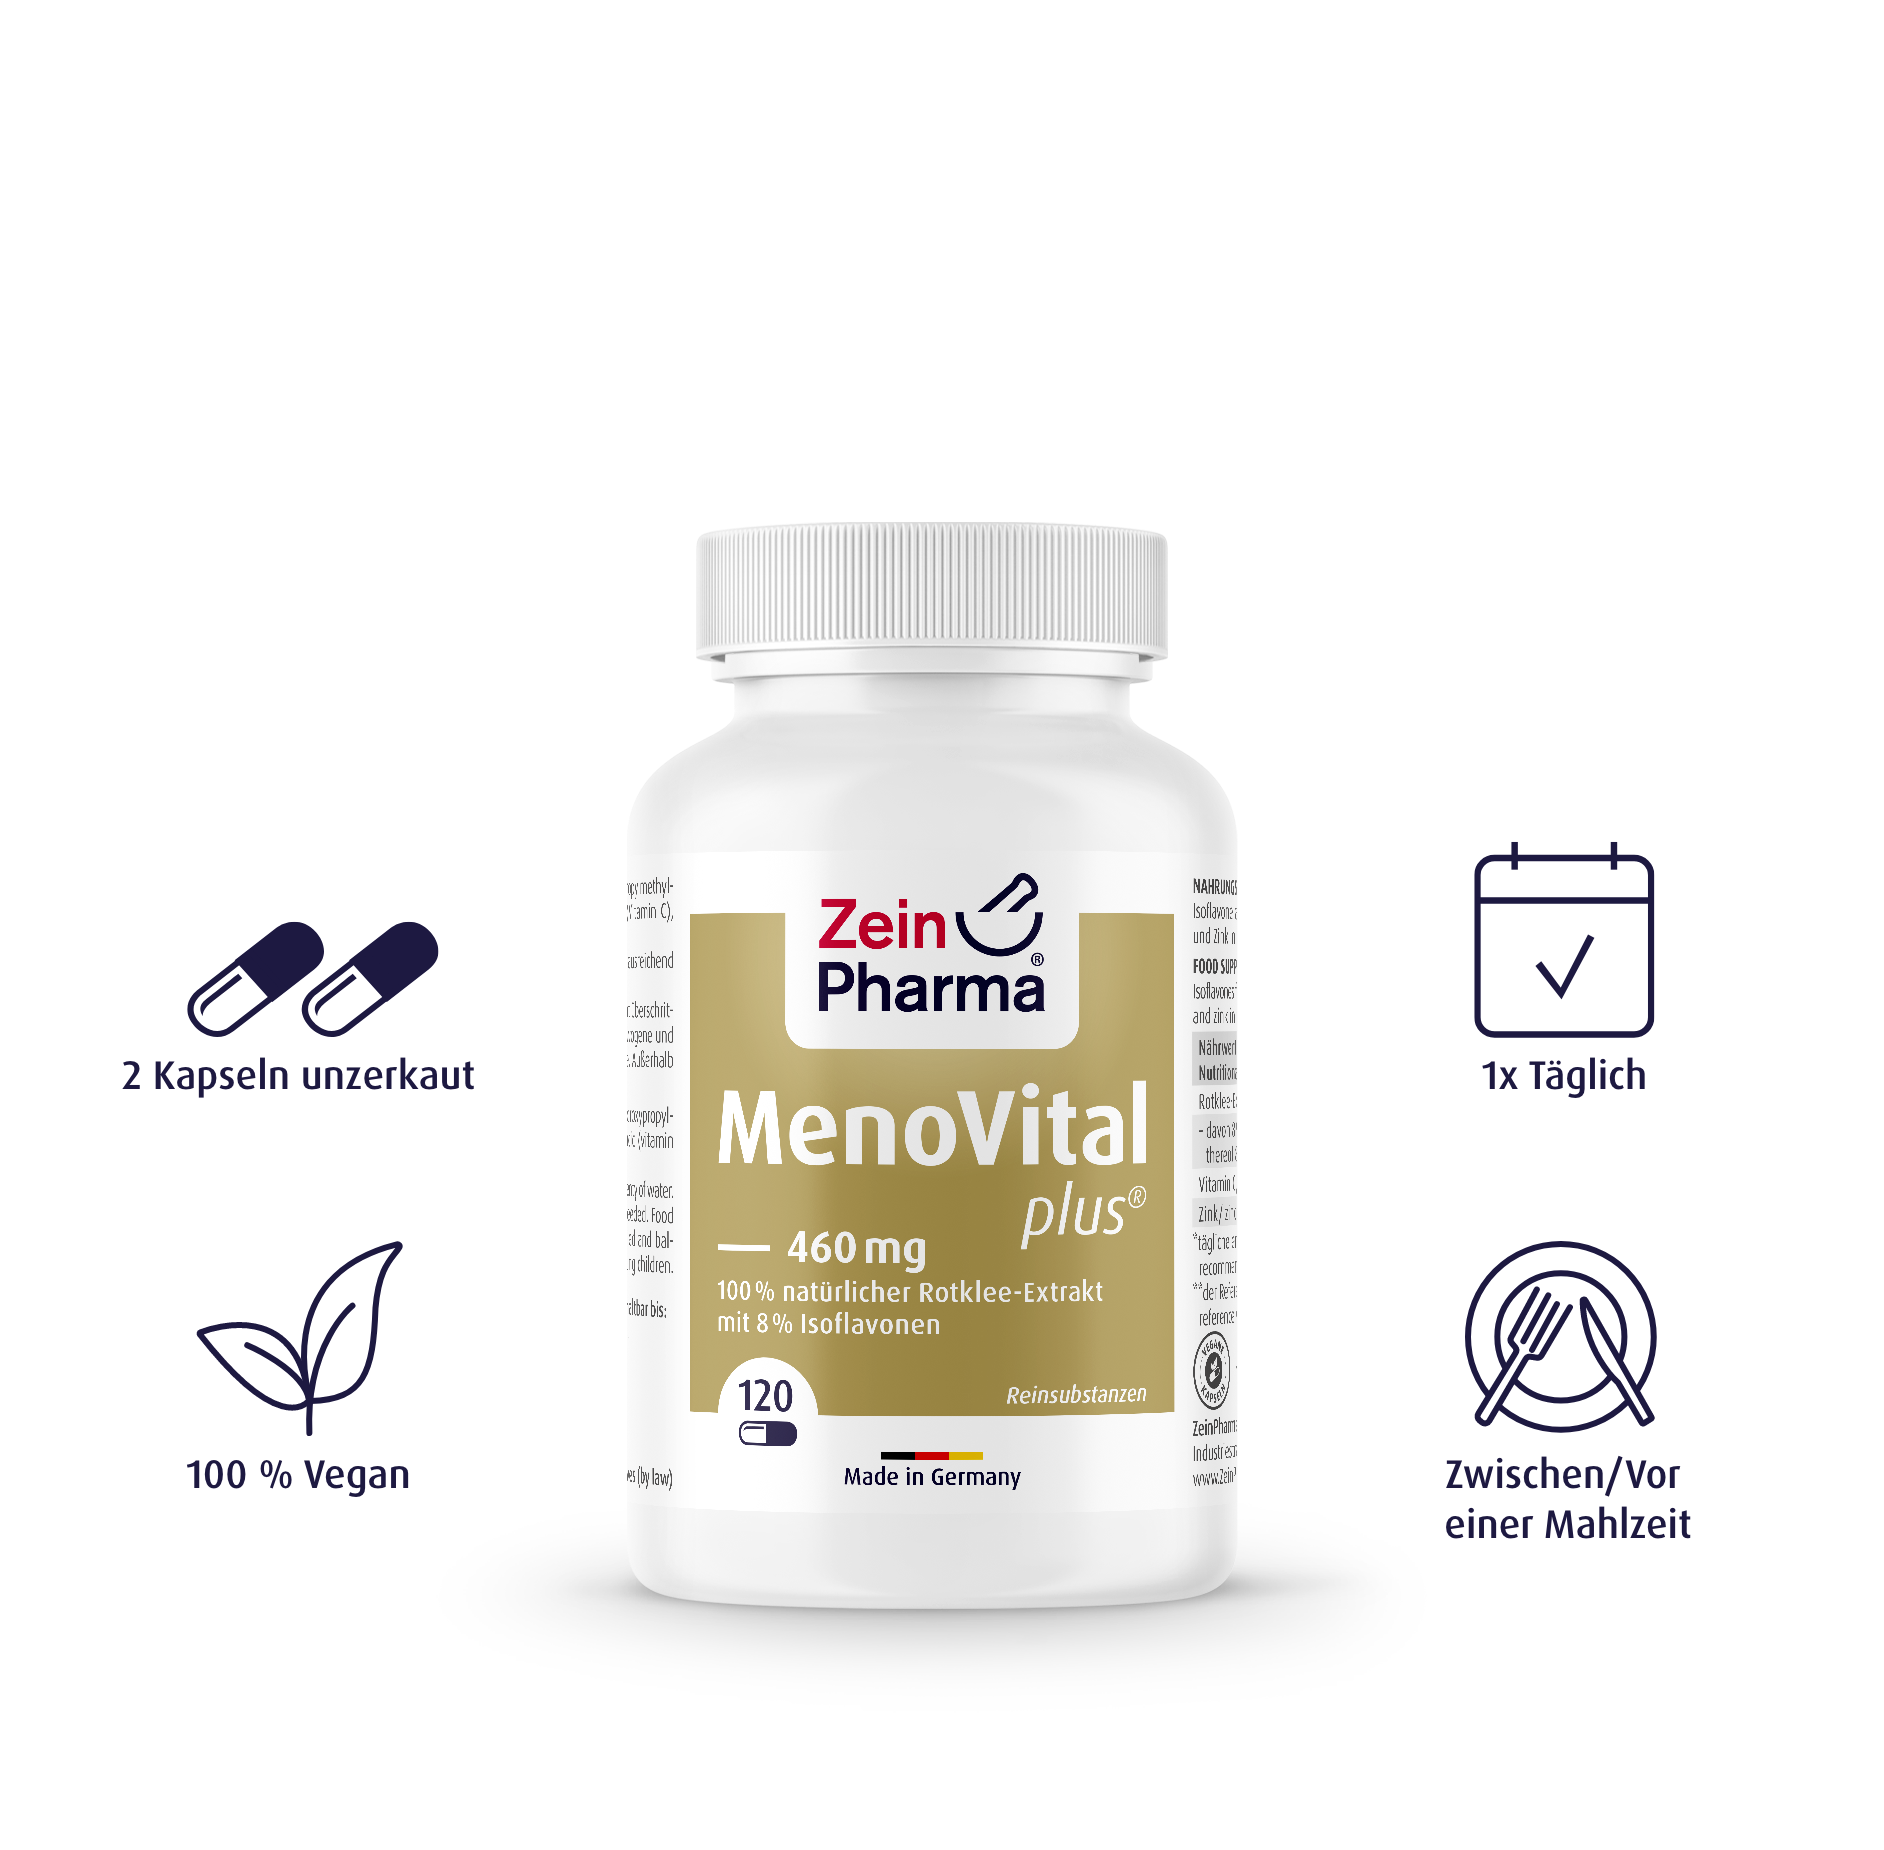 MenoVital plus® Kapseln 460 mg